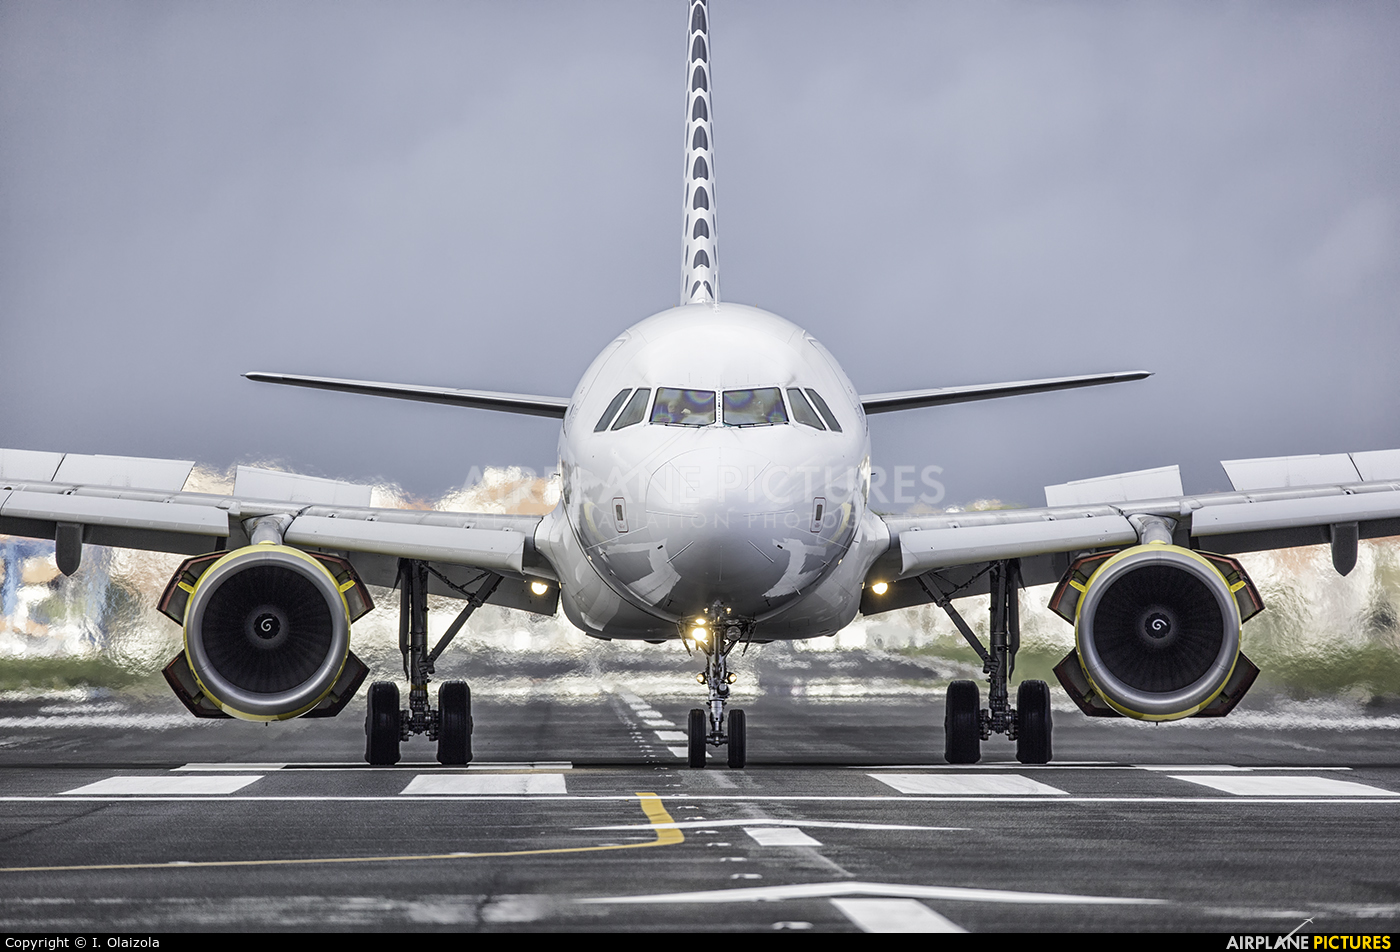 Vueling Airlines EC-MIQ aircraft at San Sebastian